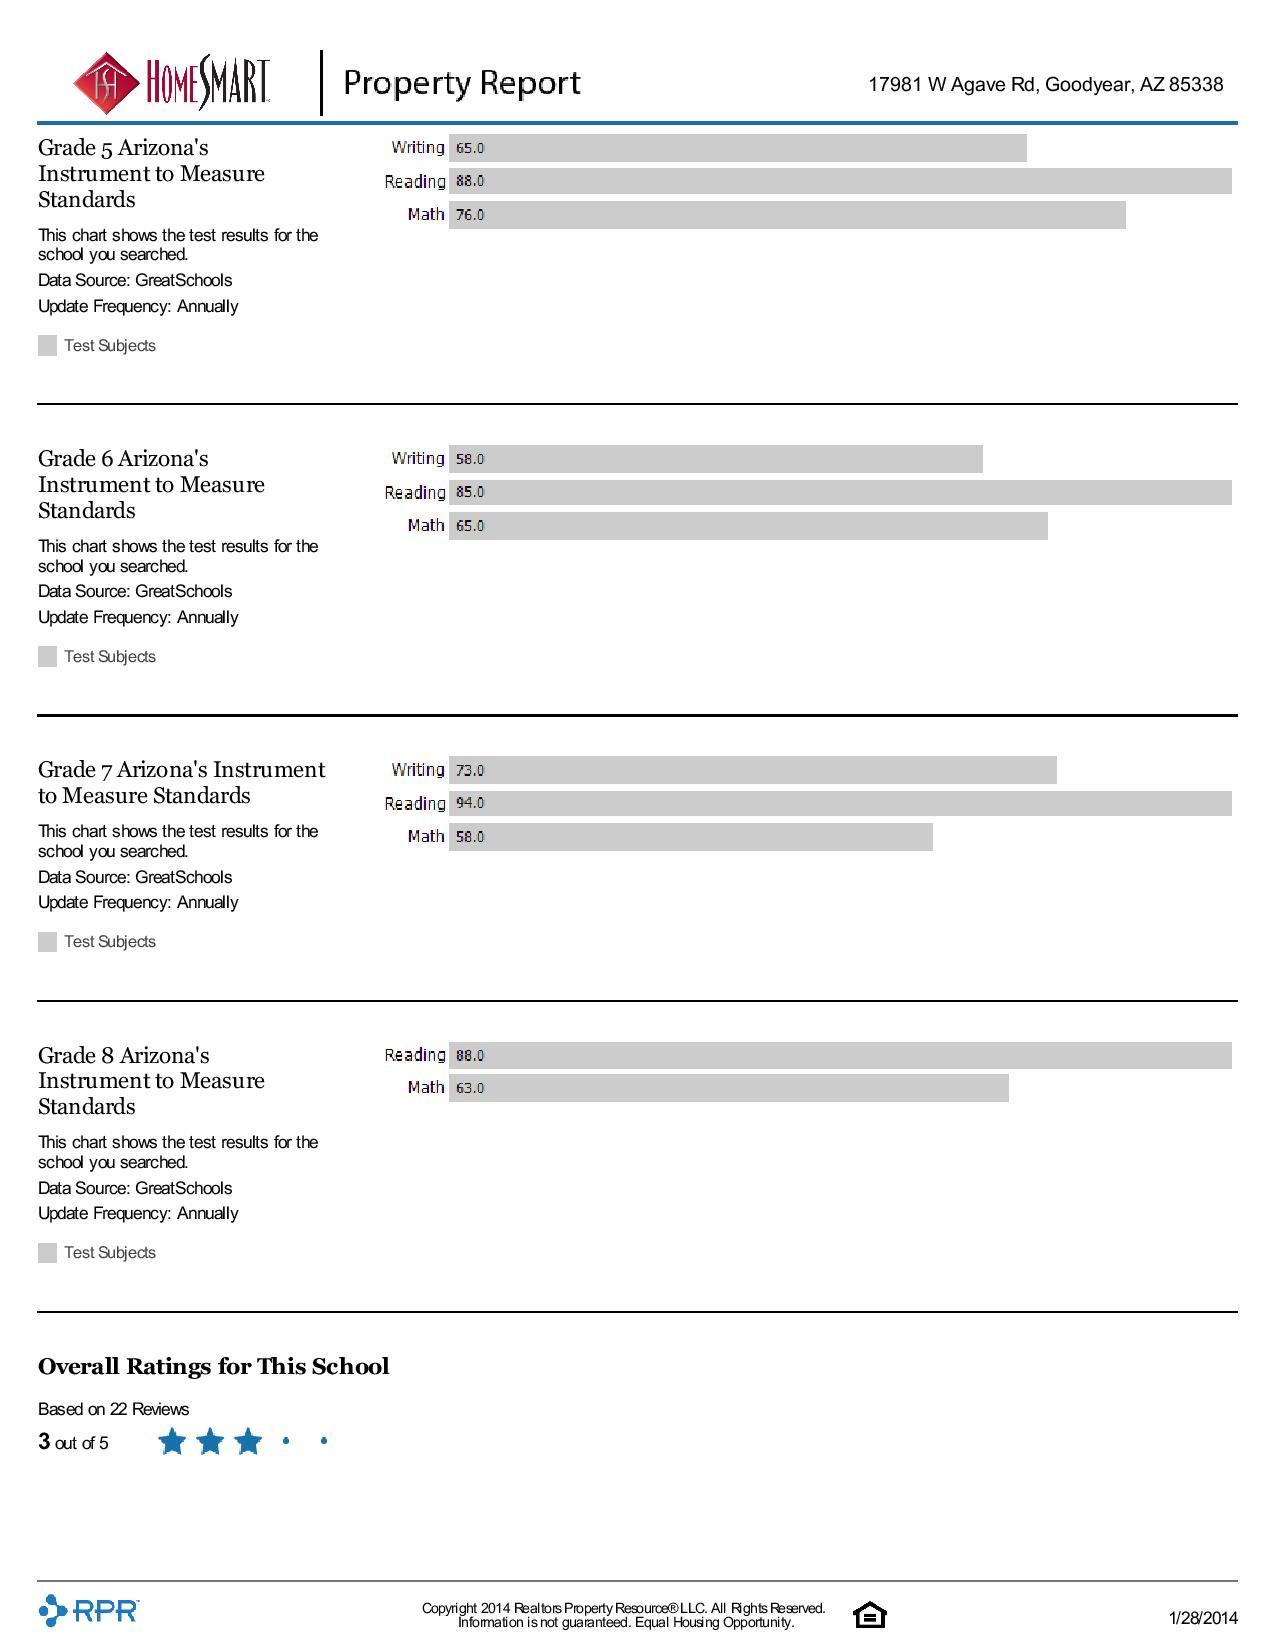 17981-W-Agave-Rd-Goodyear-AZ-85338.pdf-page-014